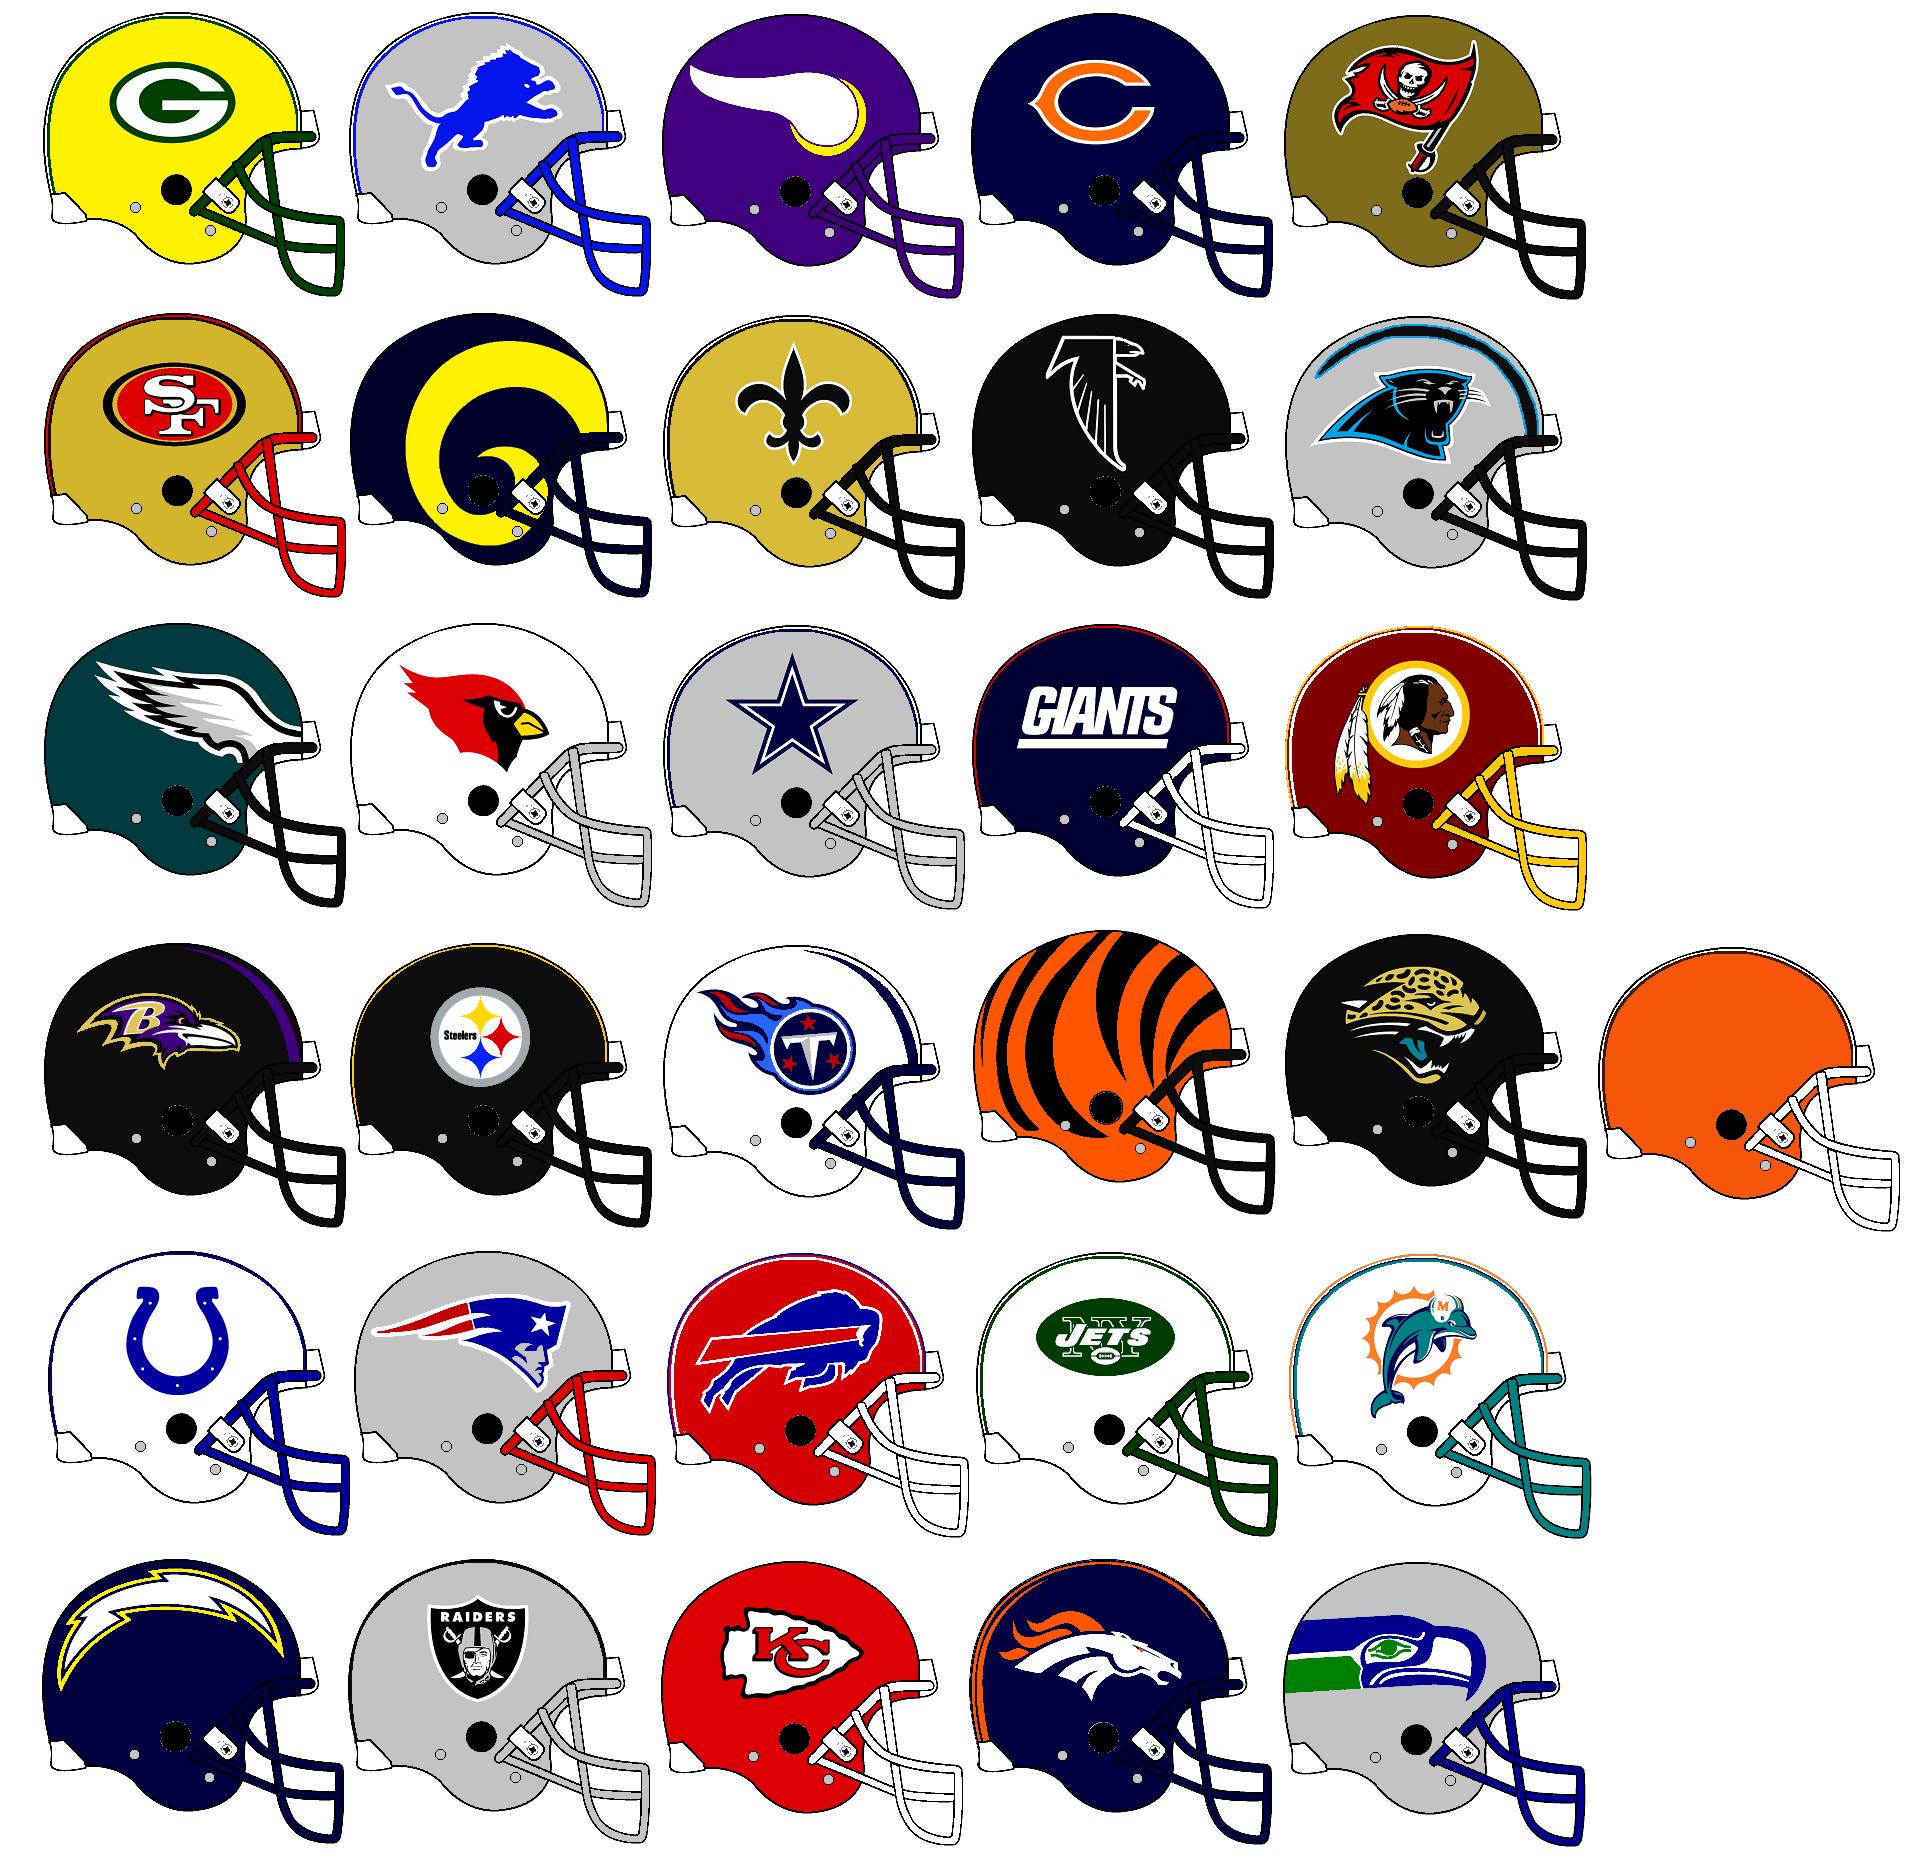 Nfl Team Helmets 1999 By Chenglor55 On DeviantArt